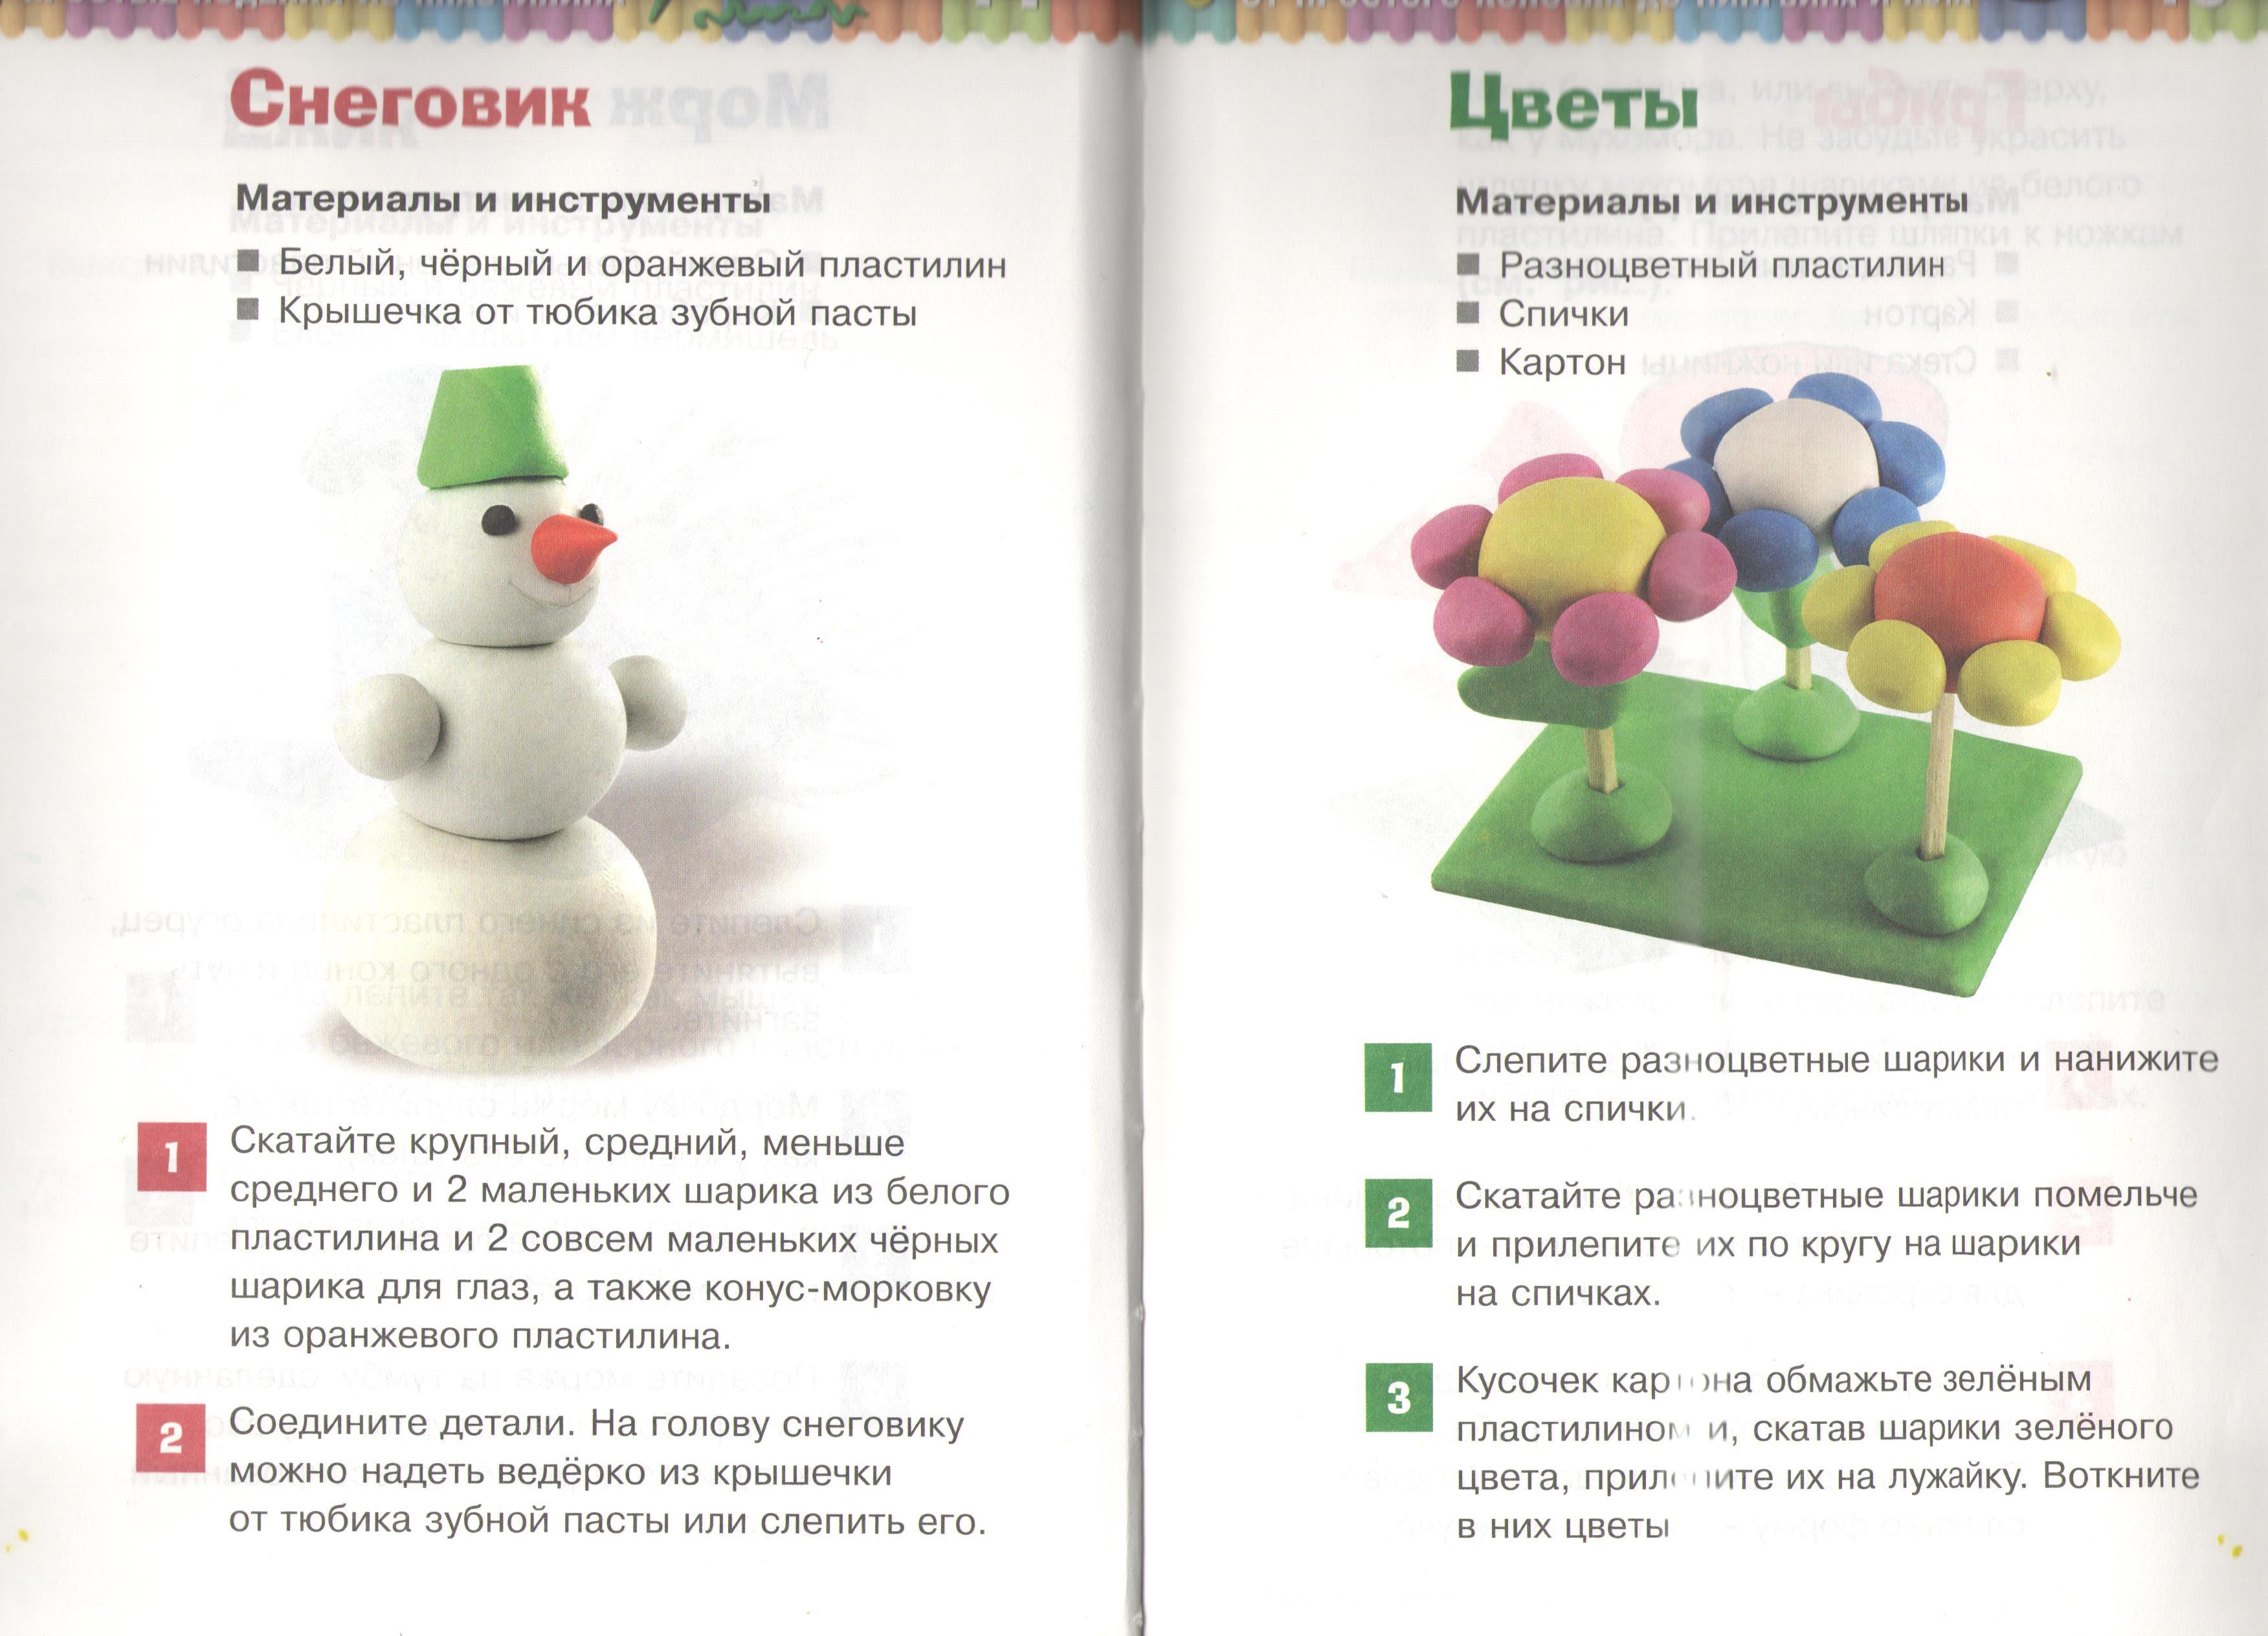 C:\Users\Admin\Desktop\Работа с пластилином\пластилин-снеговик-цветы 001.jpg